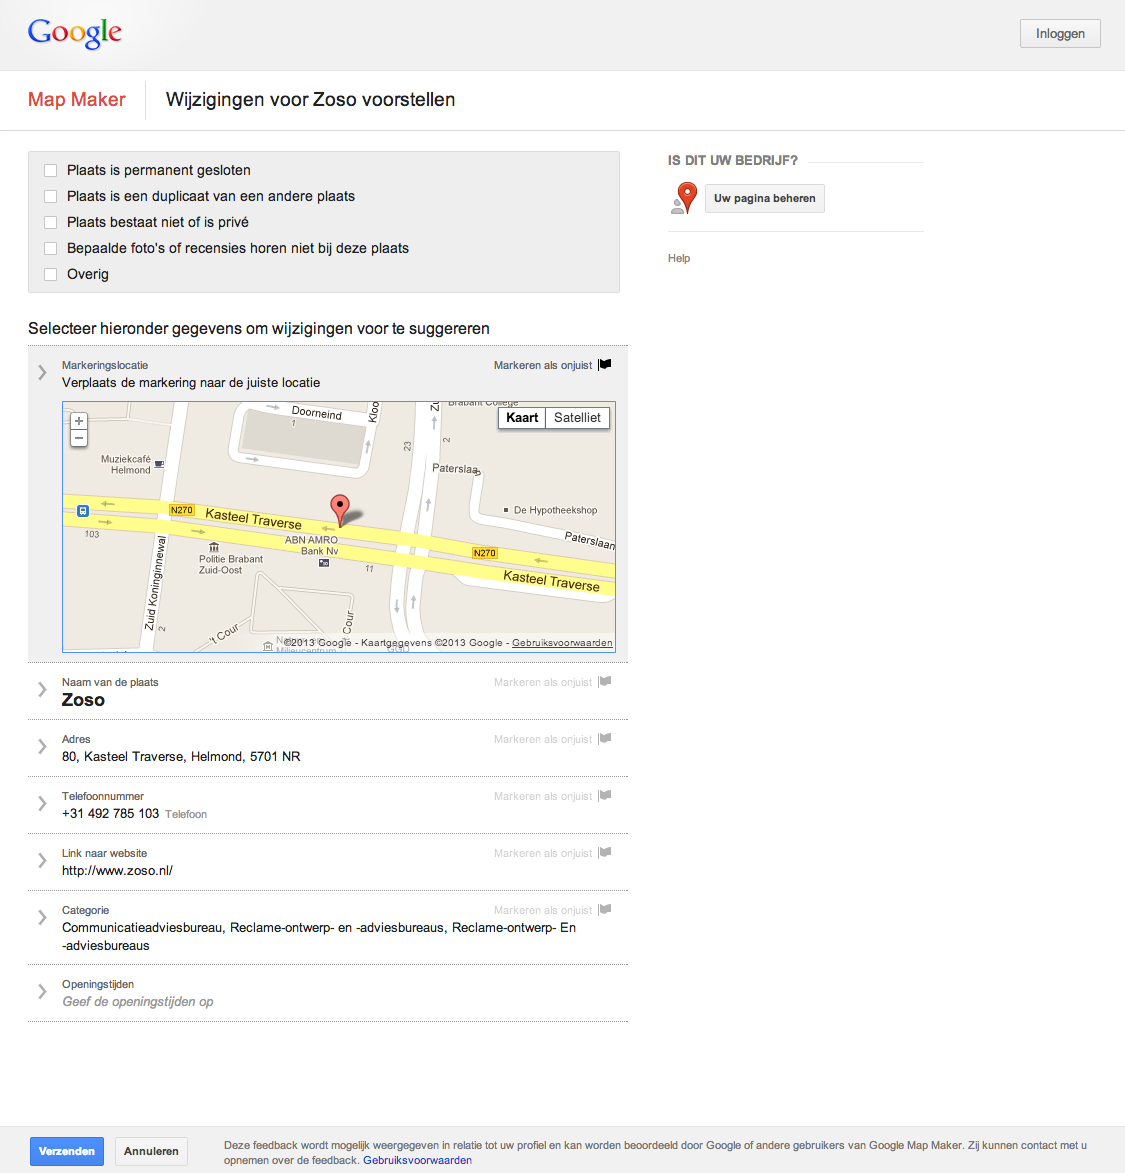 googlemapsaanpassen2.png